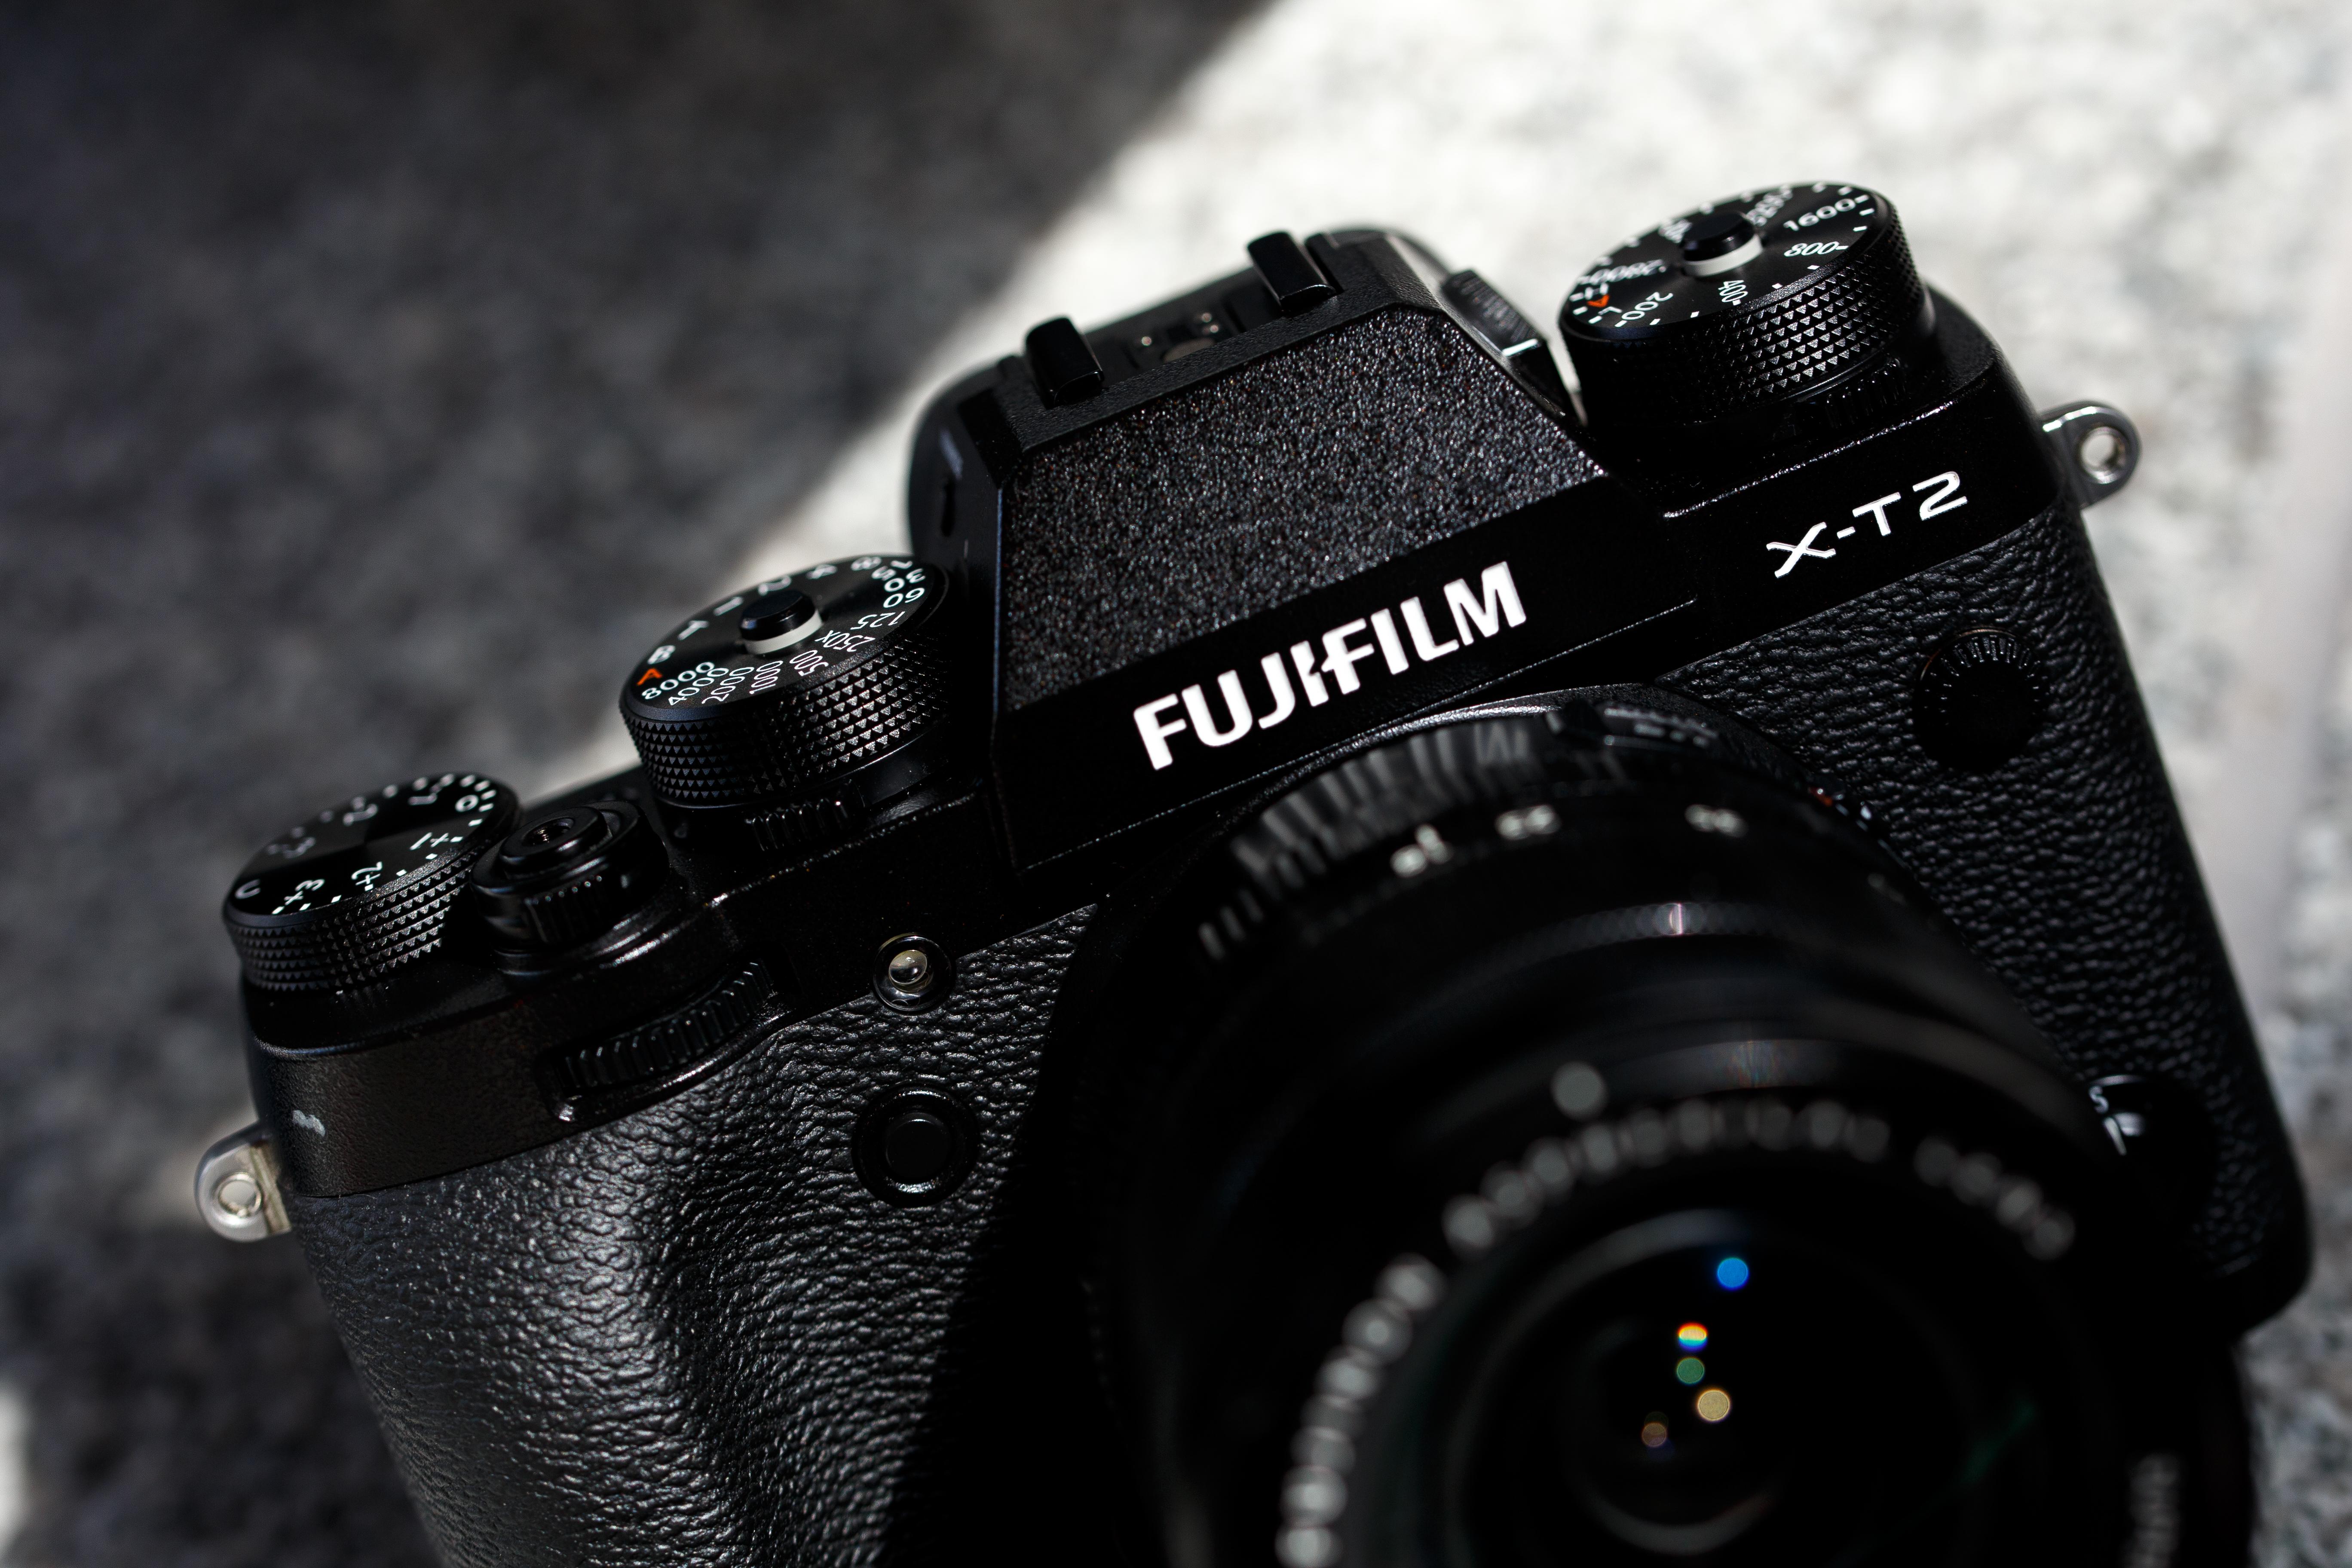 Fujifilm x100f pre-production sample gallery: digital photography.